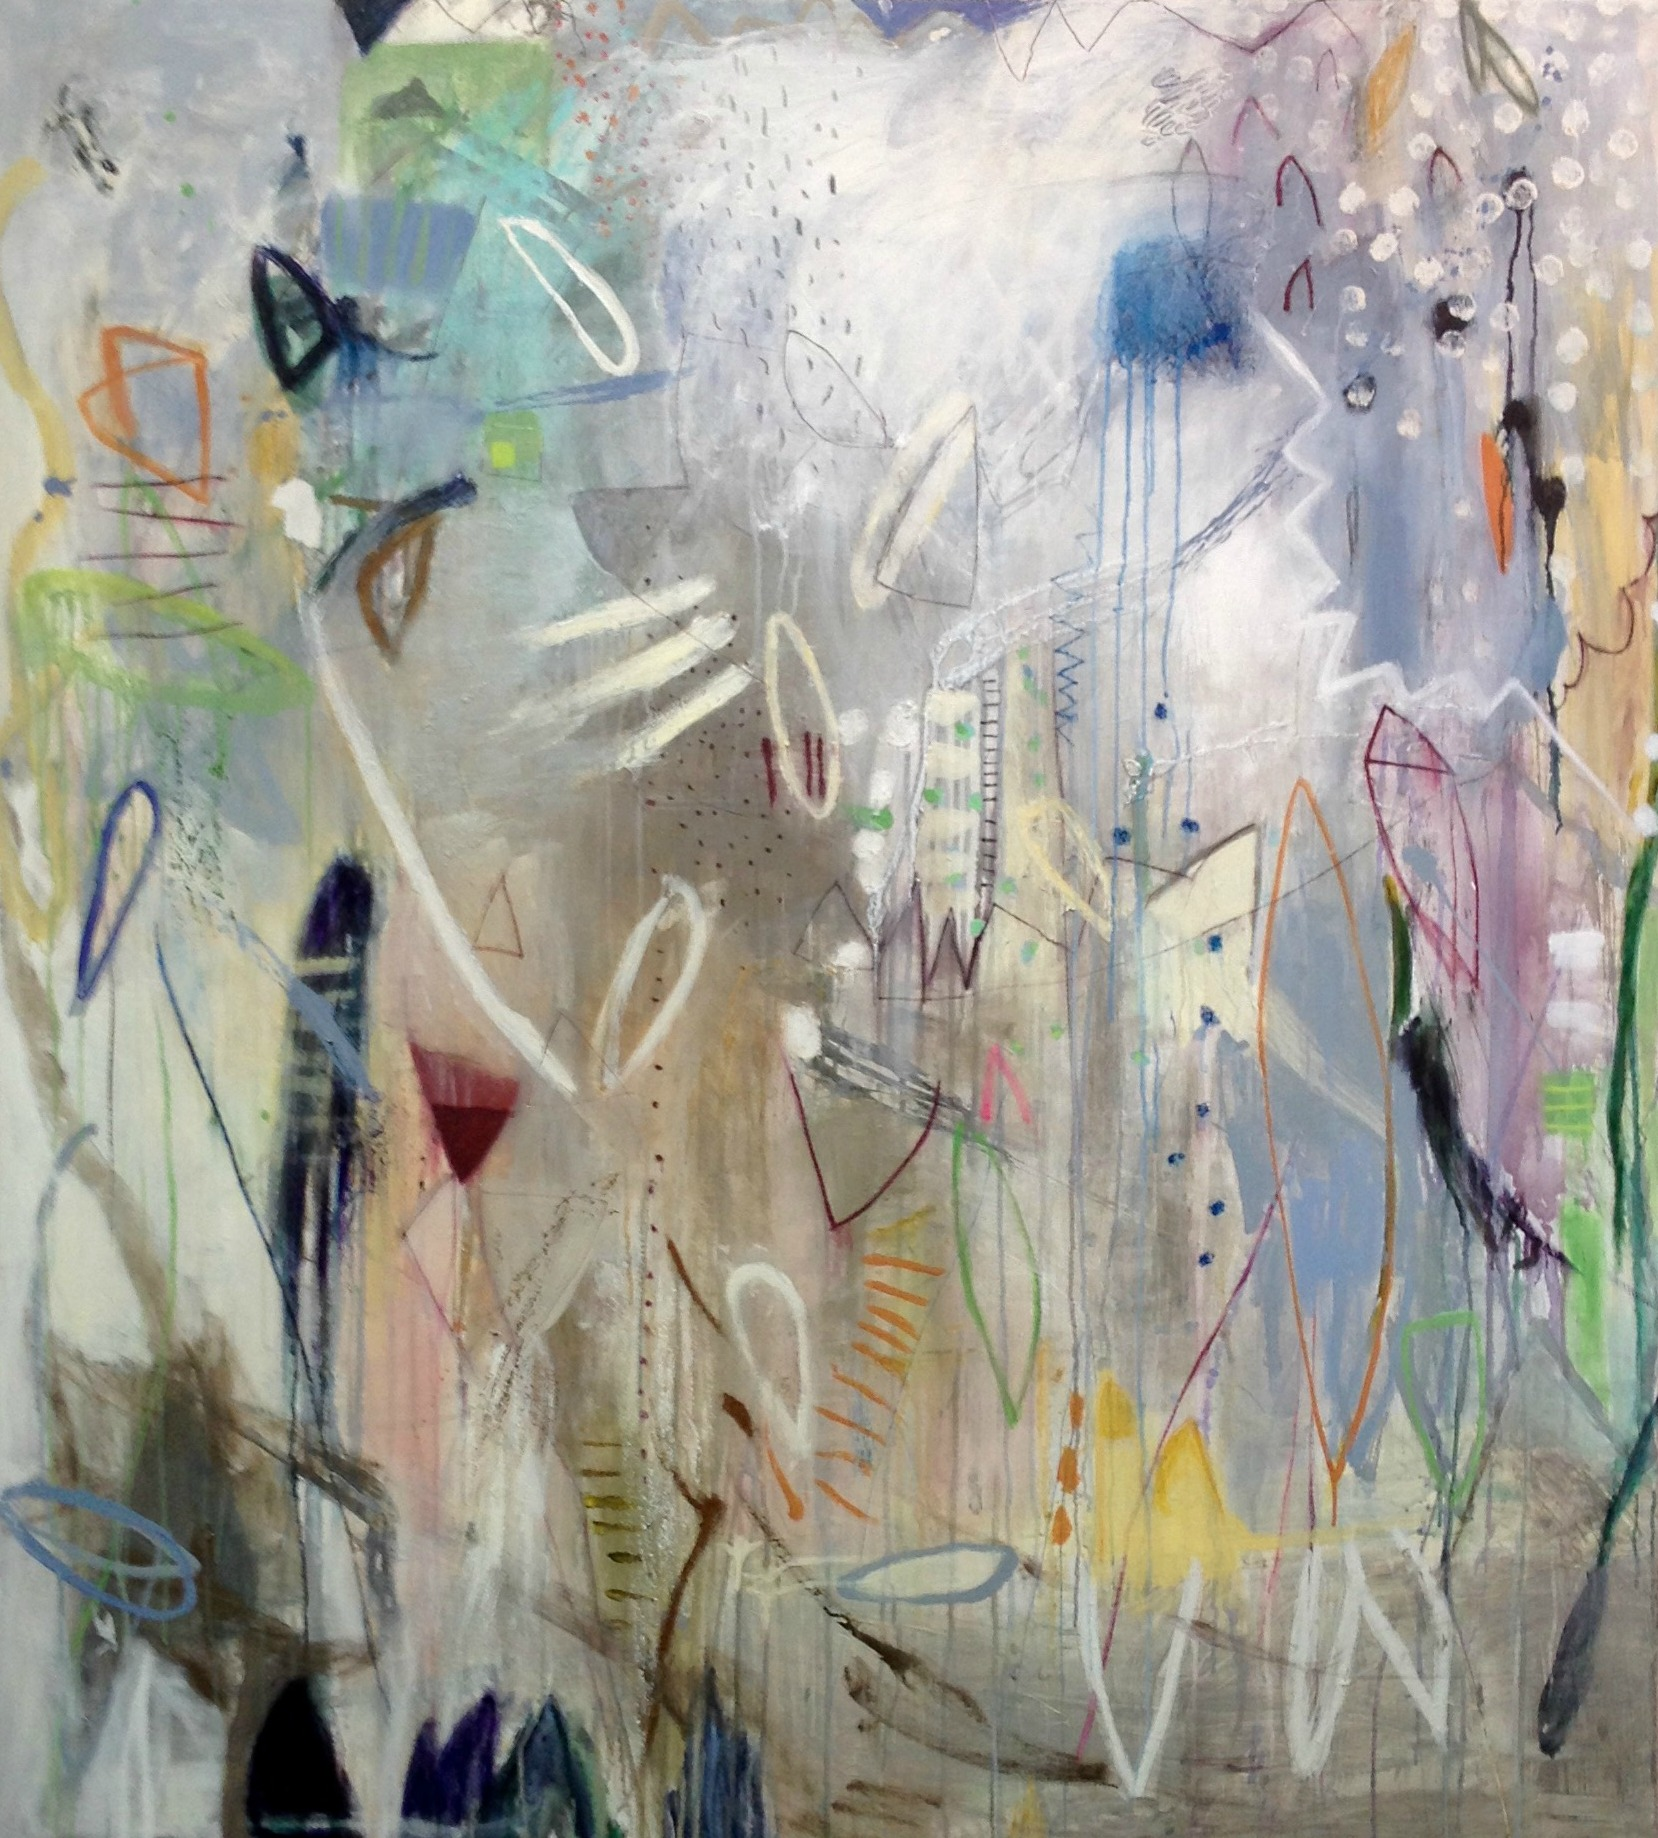 Michelle Breton,  Les Folies , Acrylic on Canvas, 157 x 142cm, $9,900